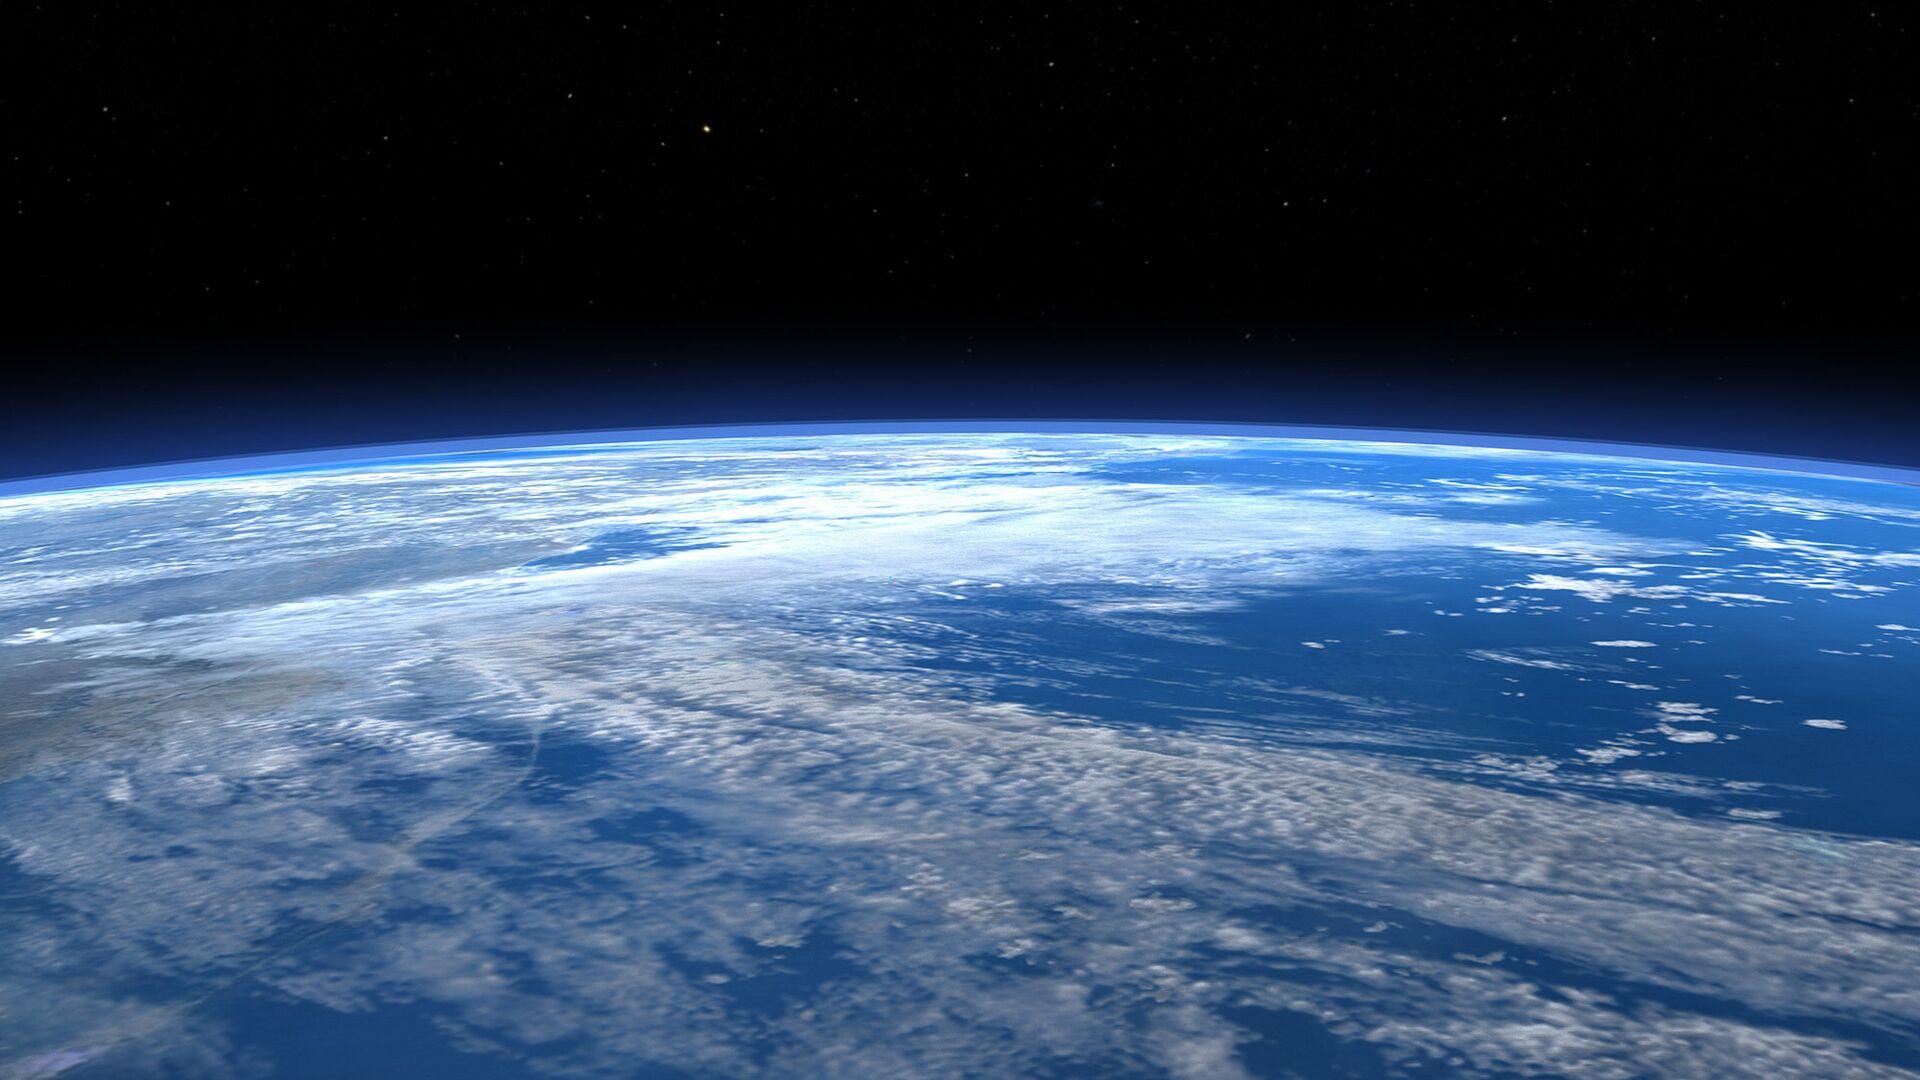 Вид на планету Земля из космоса - РИА Новости, 1920, 14.06.2021